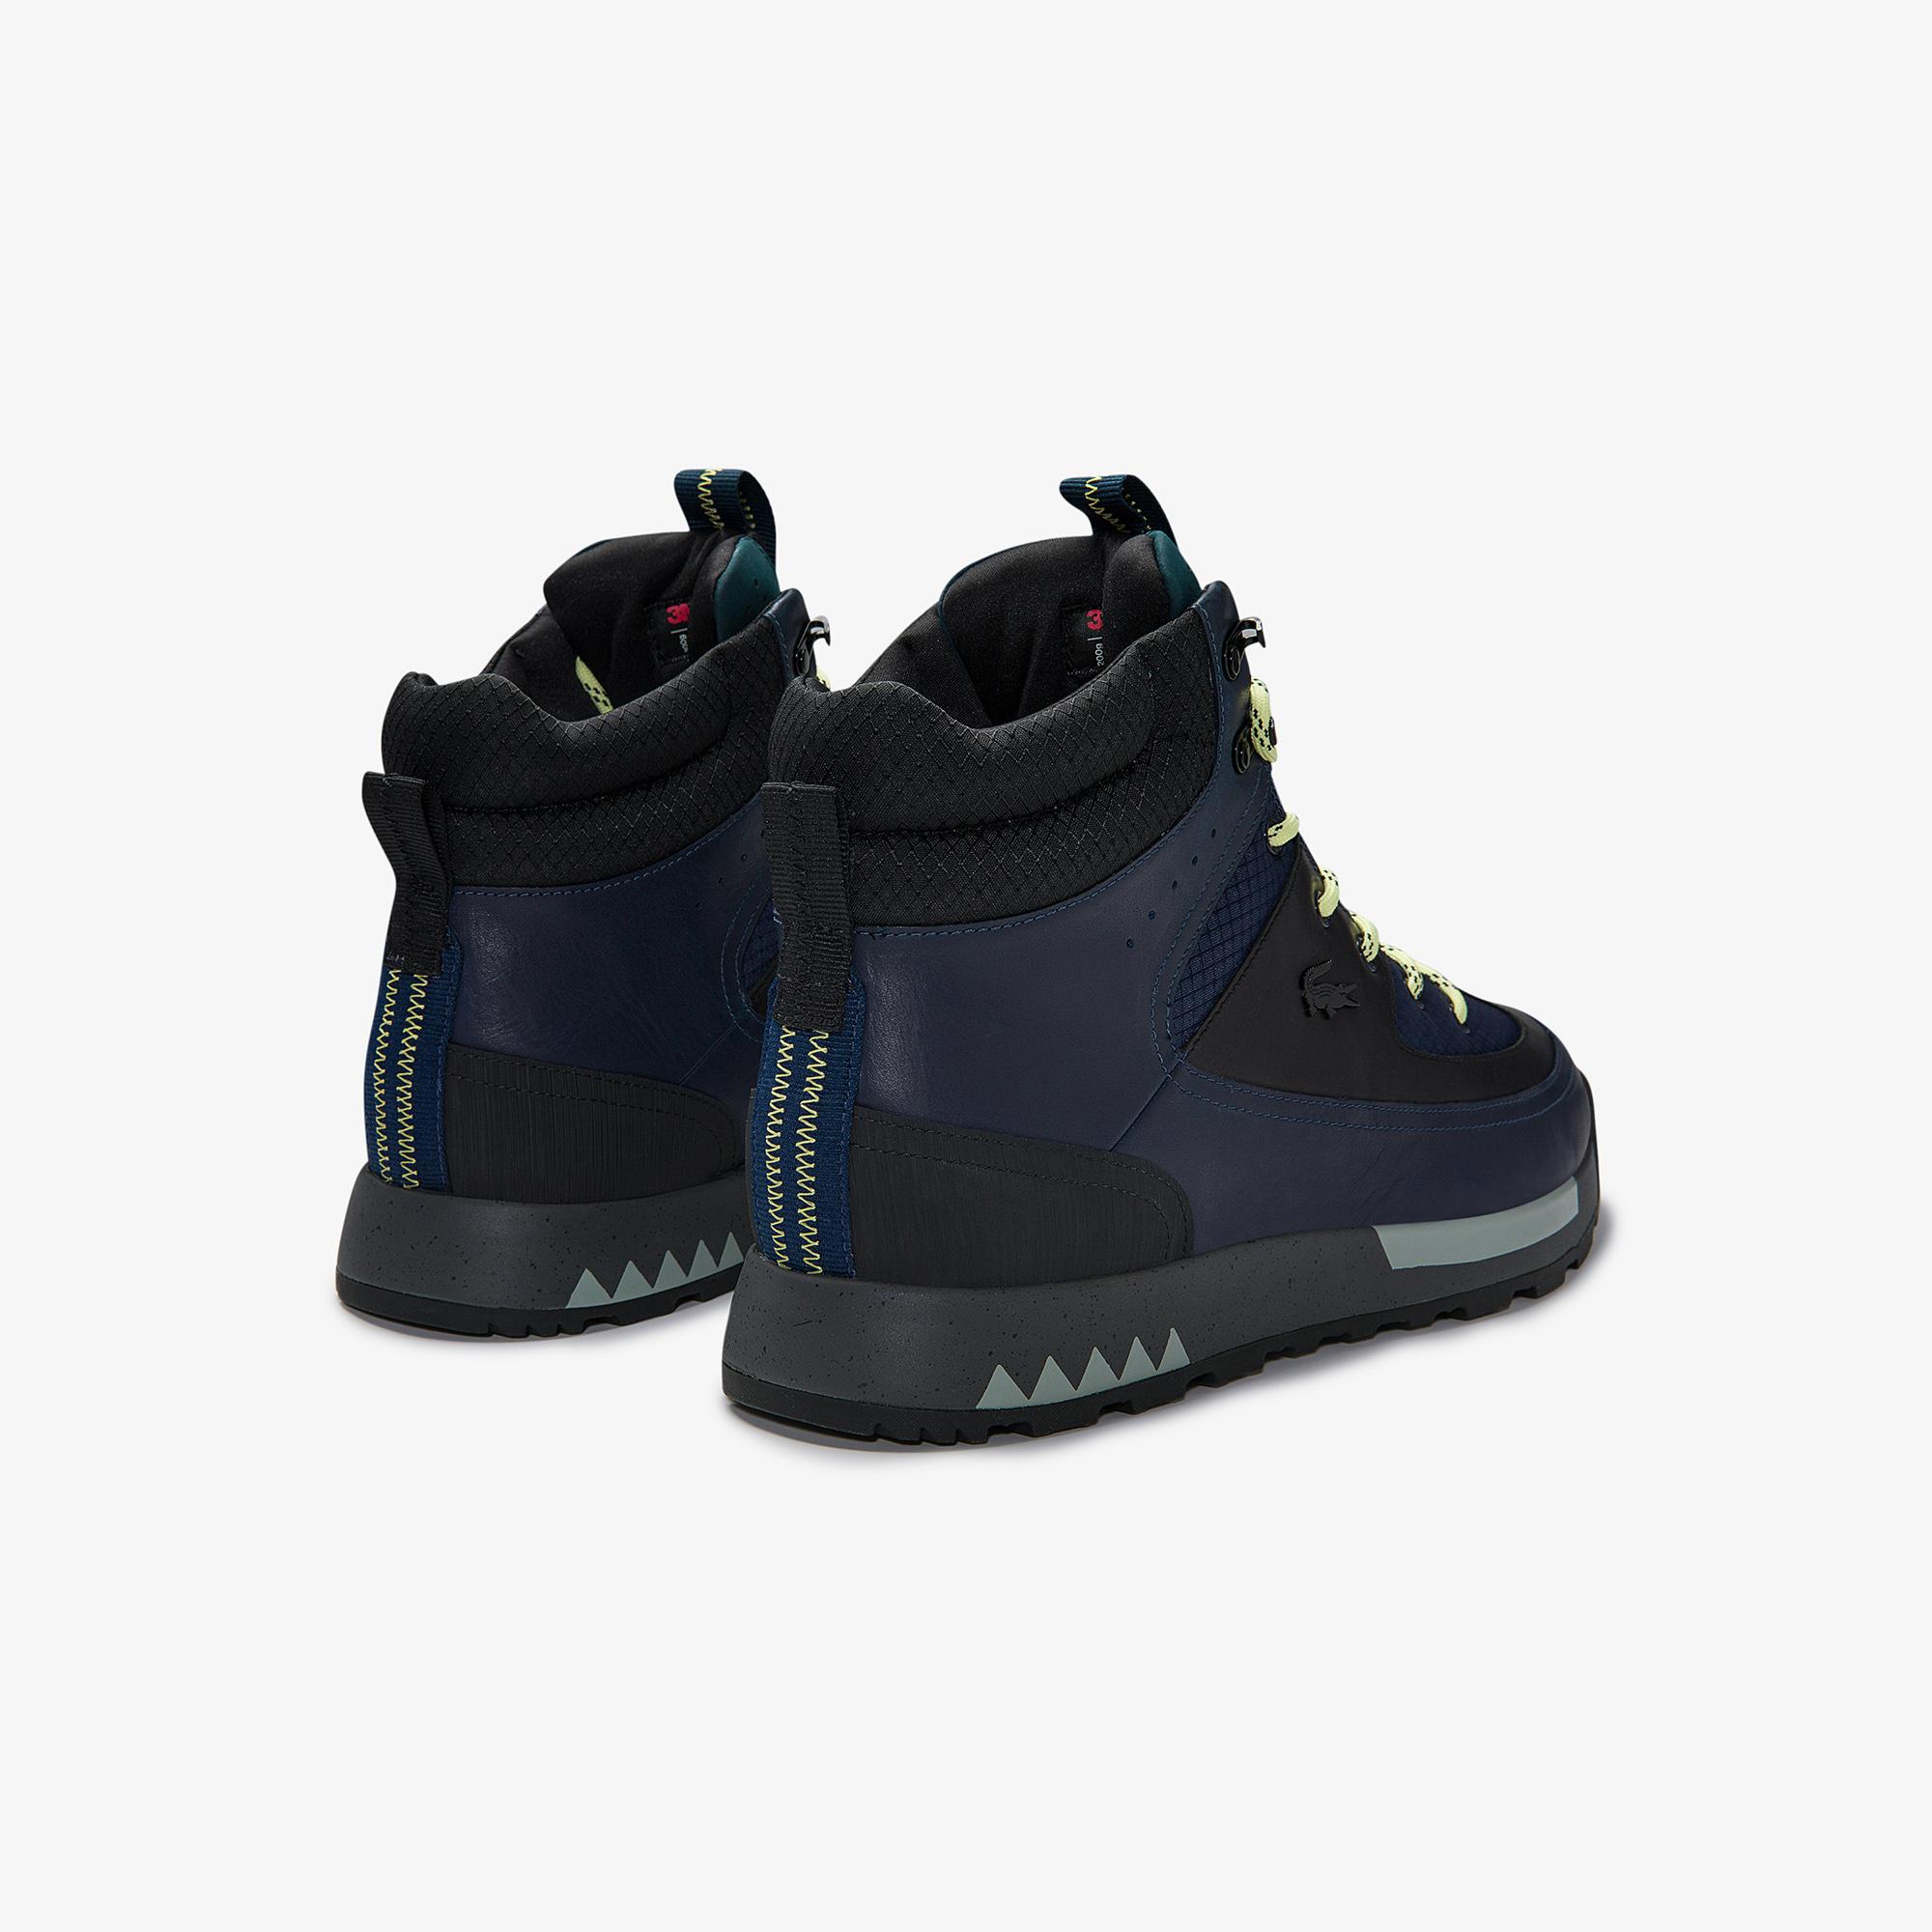 Lacoste черевики чоловічі Urban Breaker